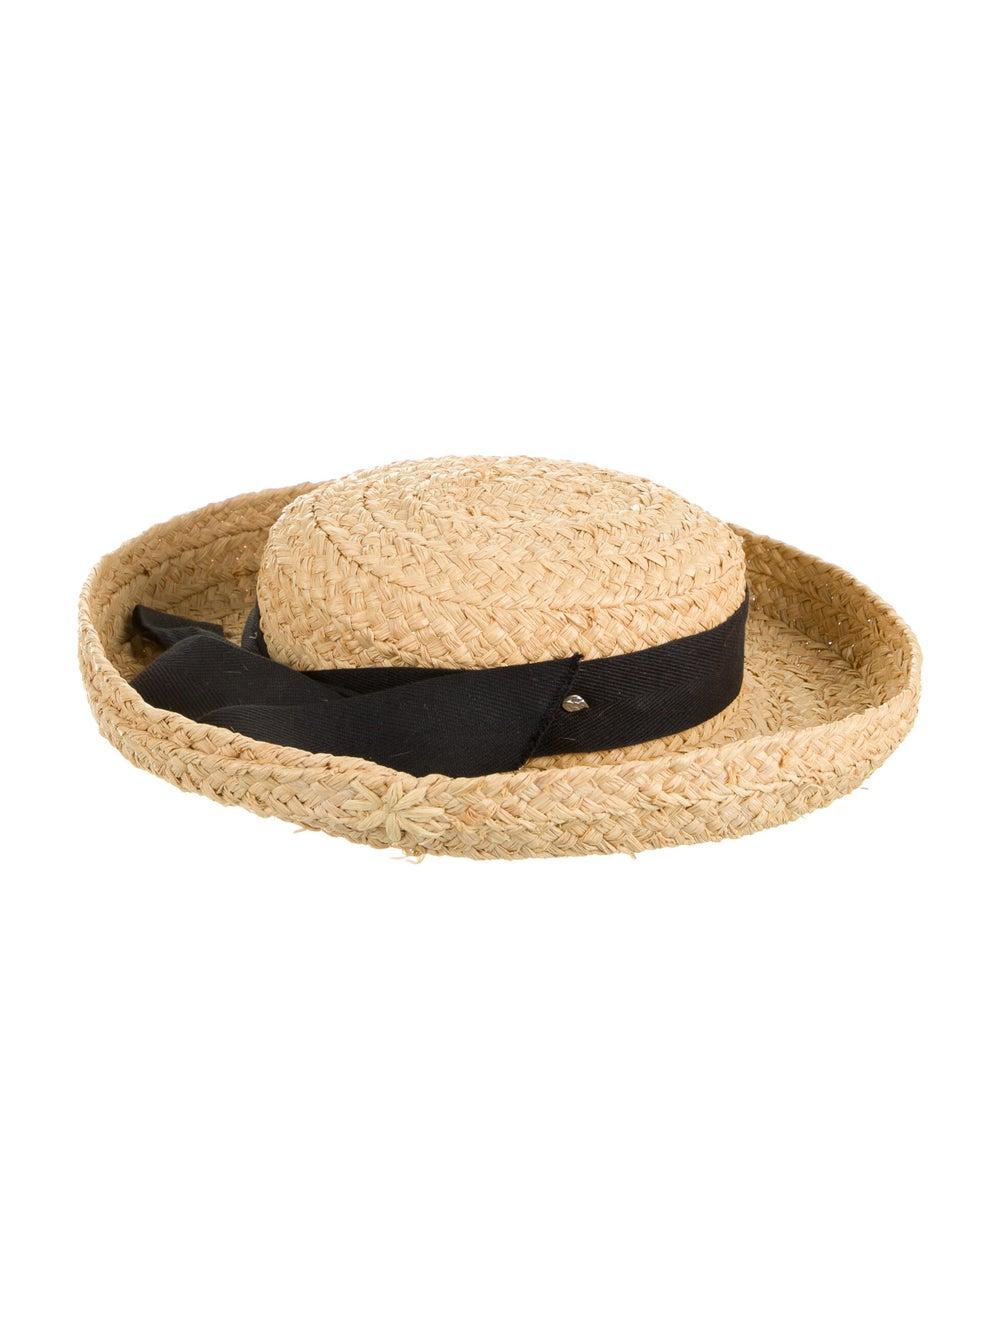 Helen Kaminski Straw Wide Brimmed Hat Tan - image 1